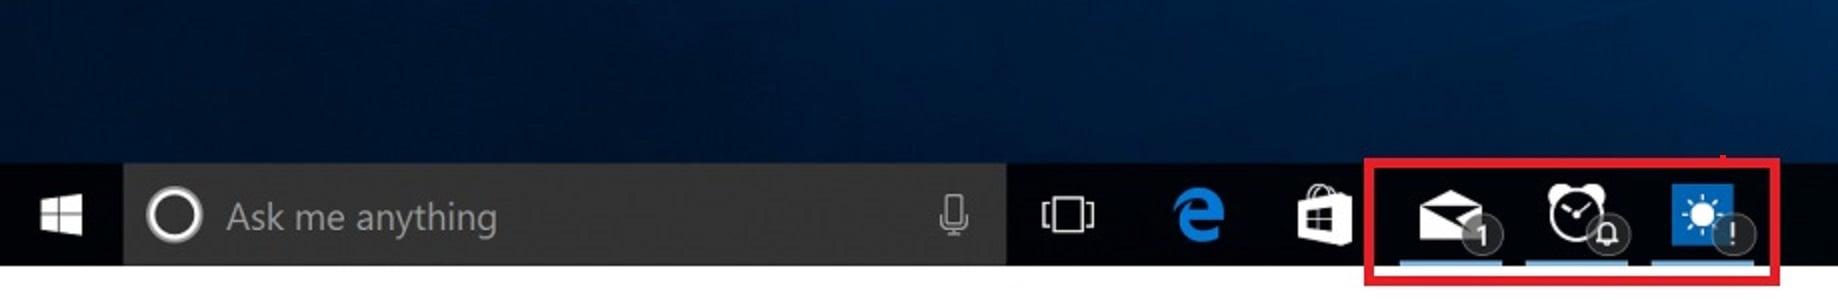 Taskbar Buttons - Hide or Show Badges in Windows 10 | Tutorials